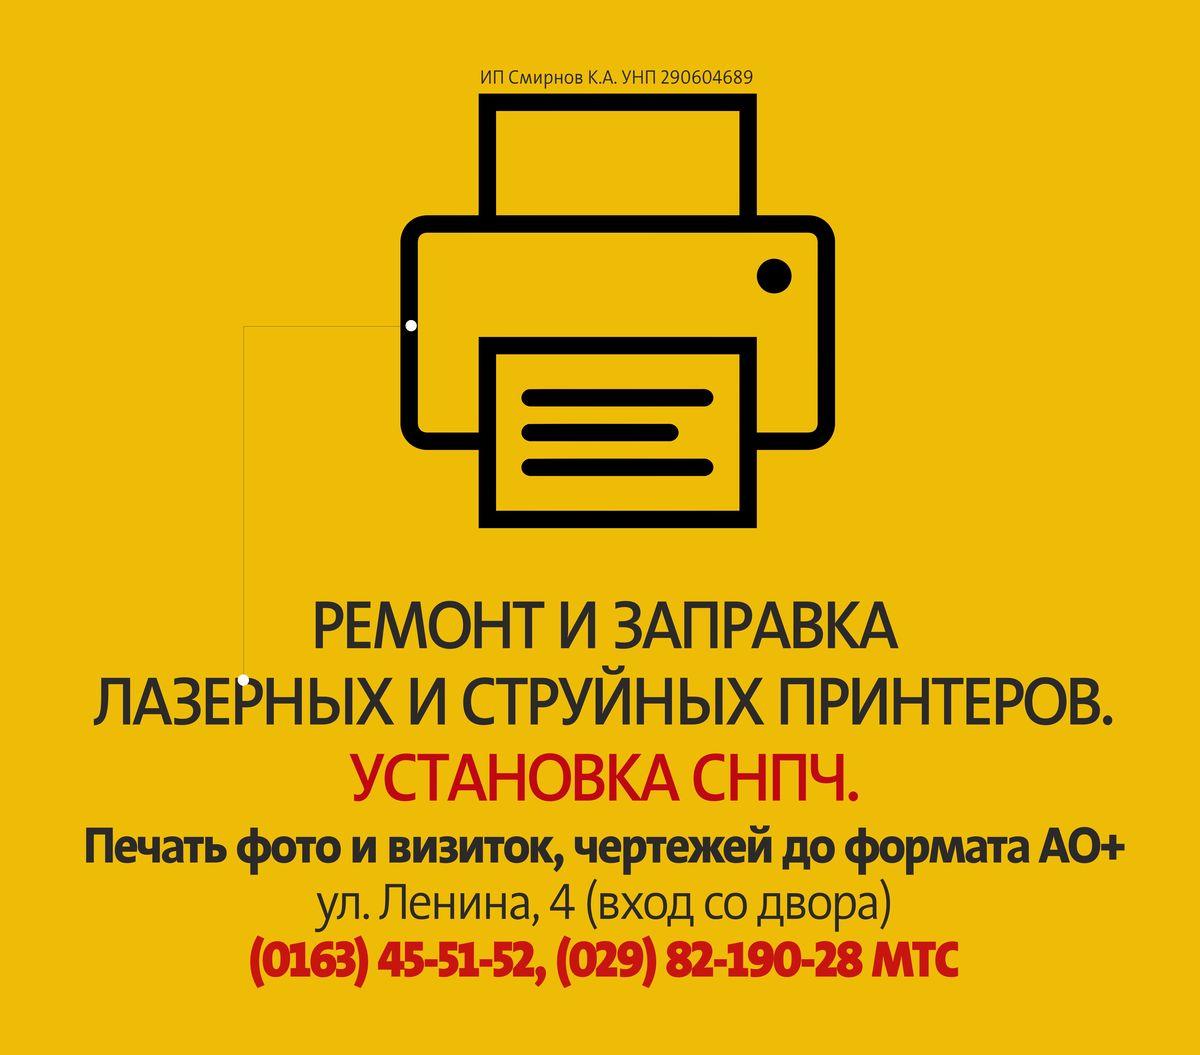 baner-sajt-pod-statyoj2